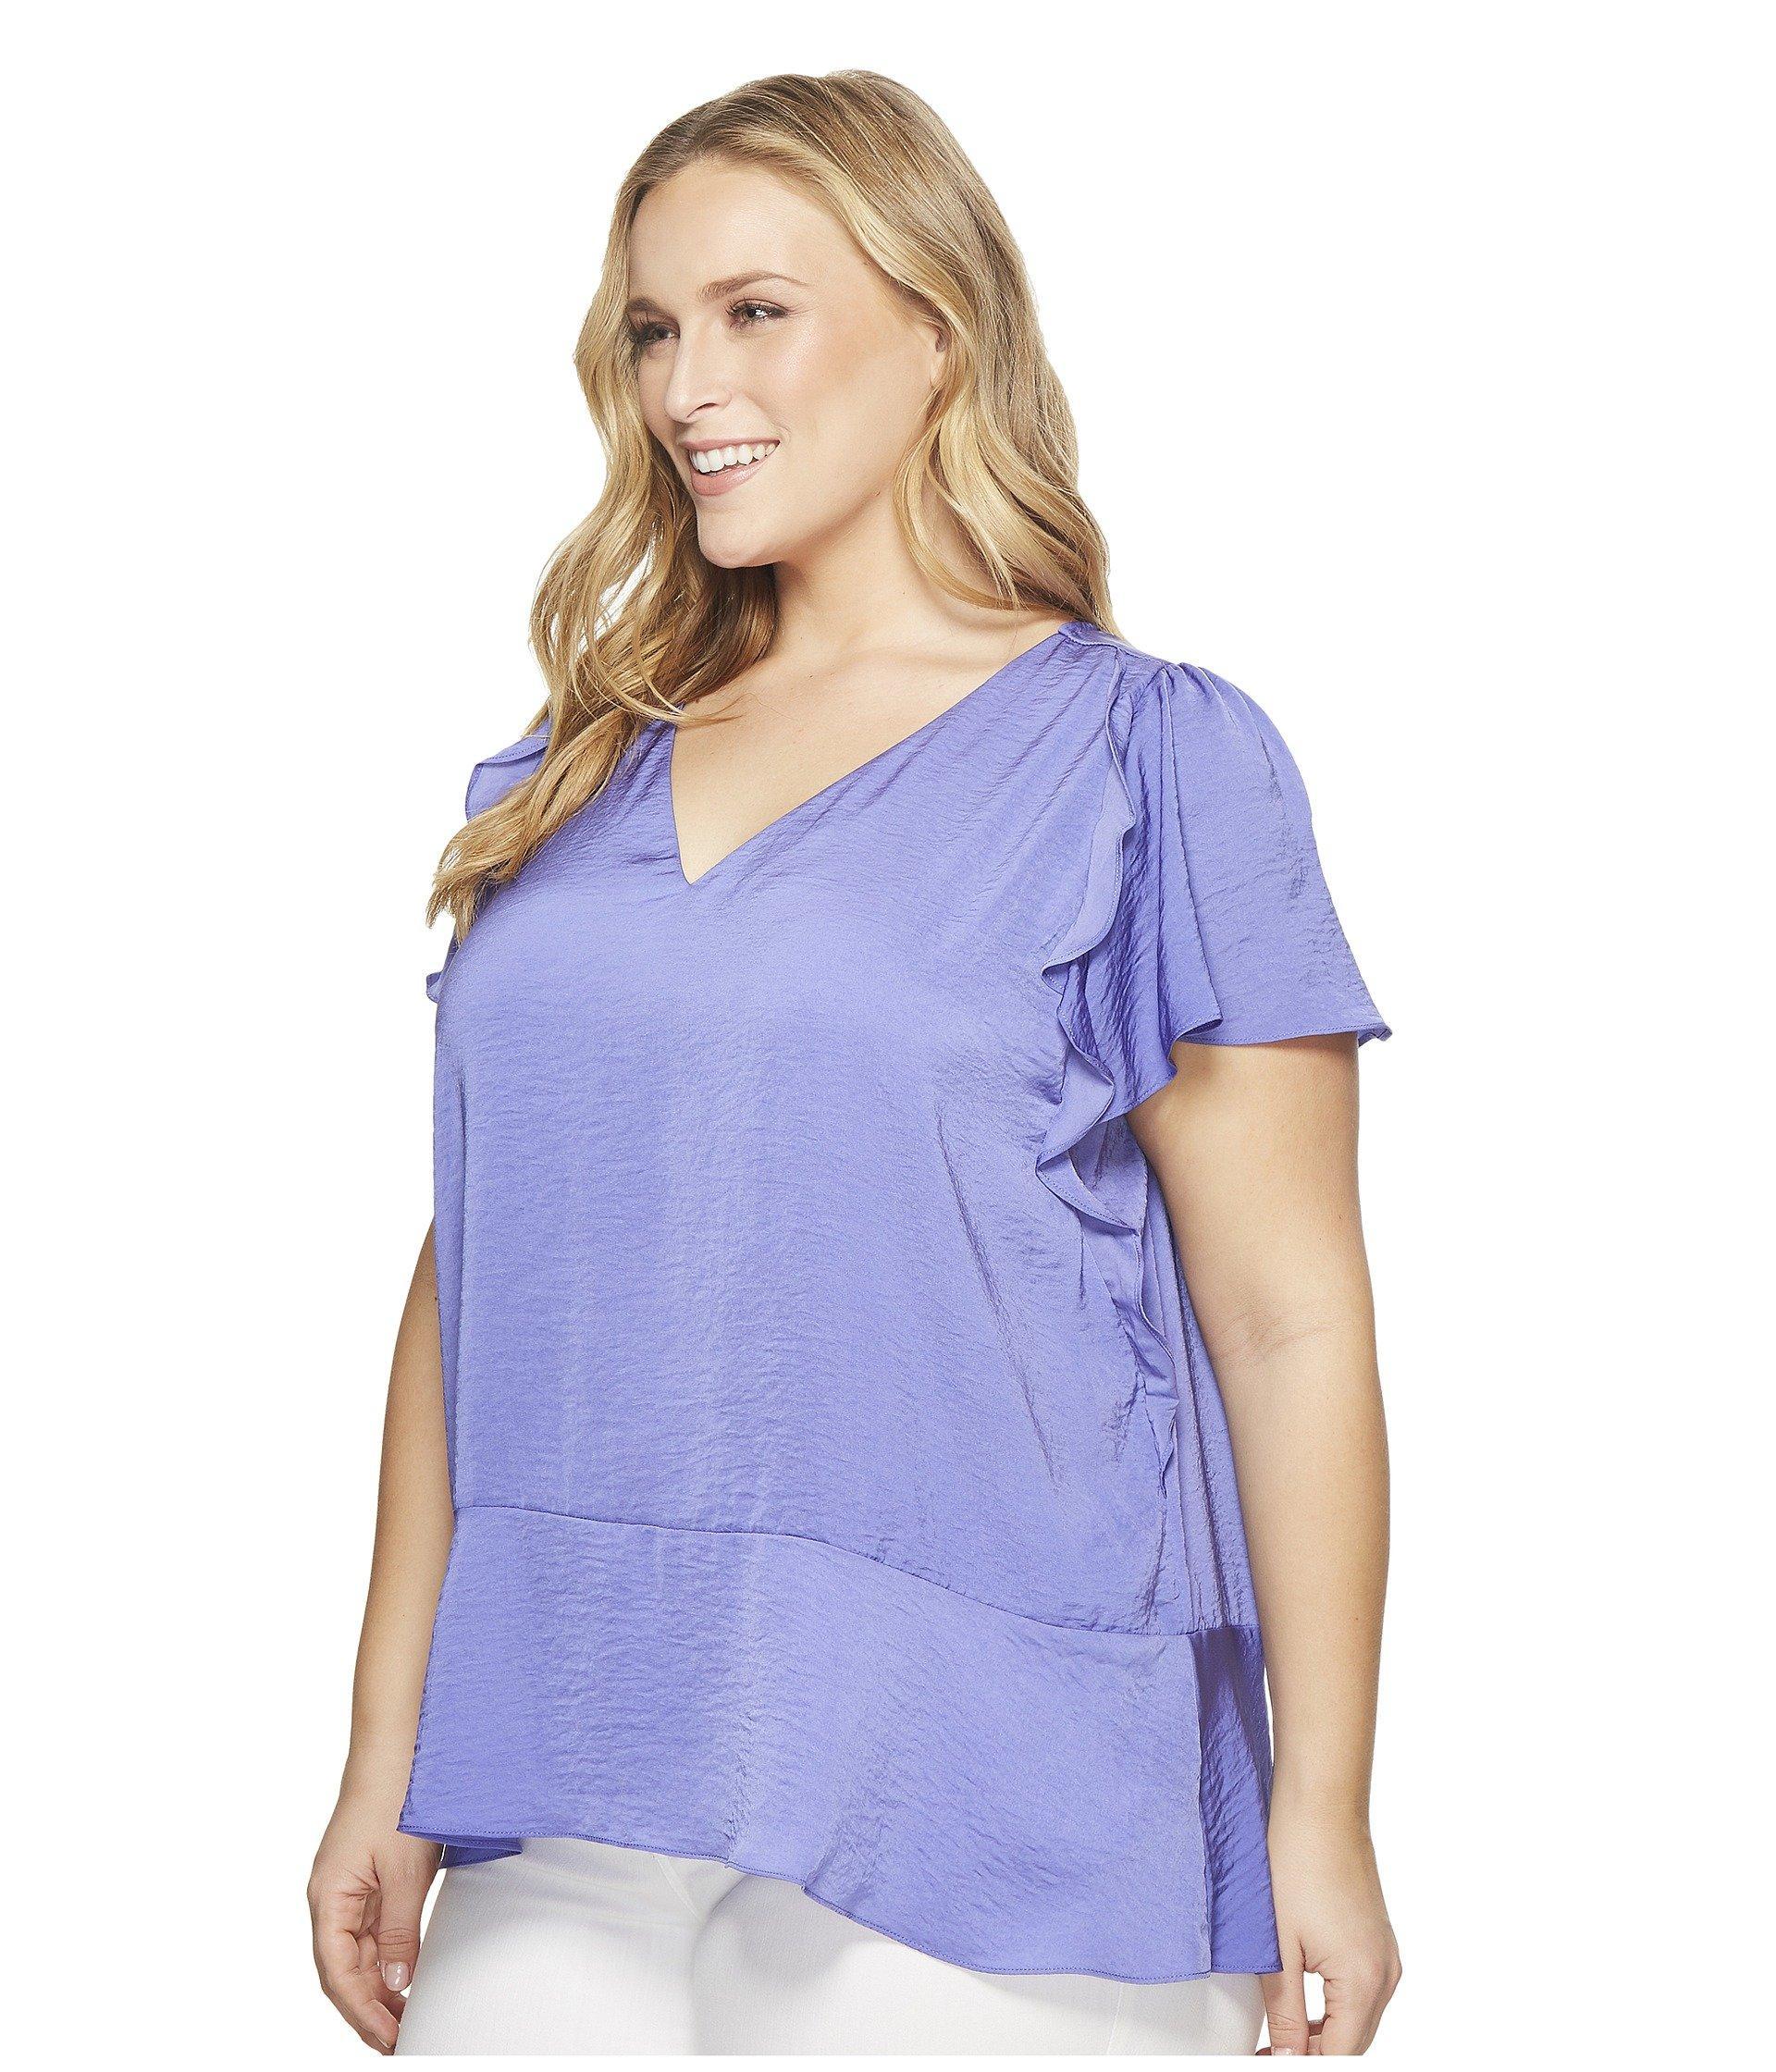 f8a5e2e5929 Lyst - MICHAEL Michael Kors Plus Size Flounce V-neck Short Sleeve Top in  Purple - Save 25%